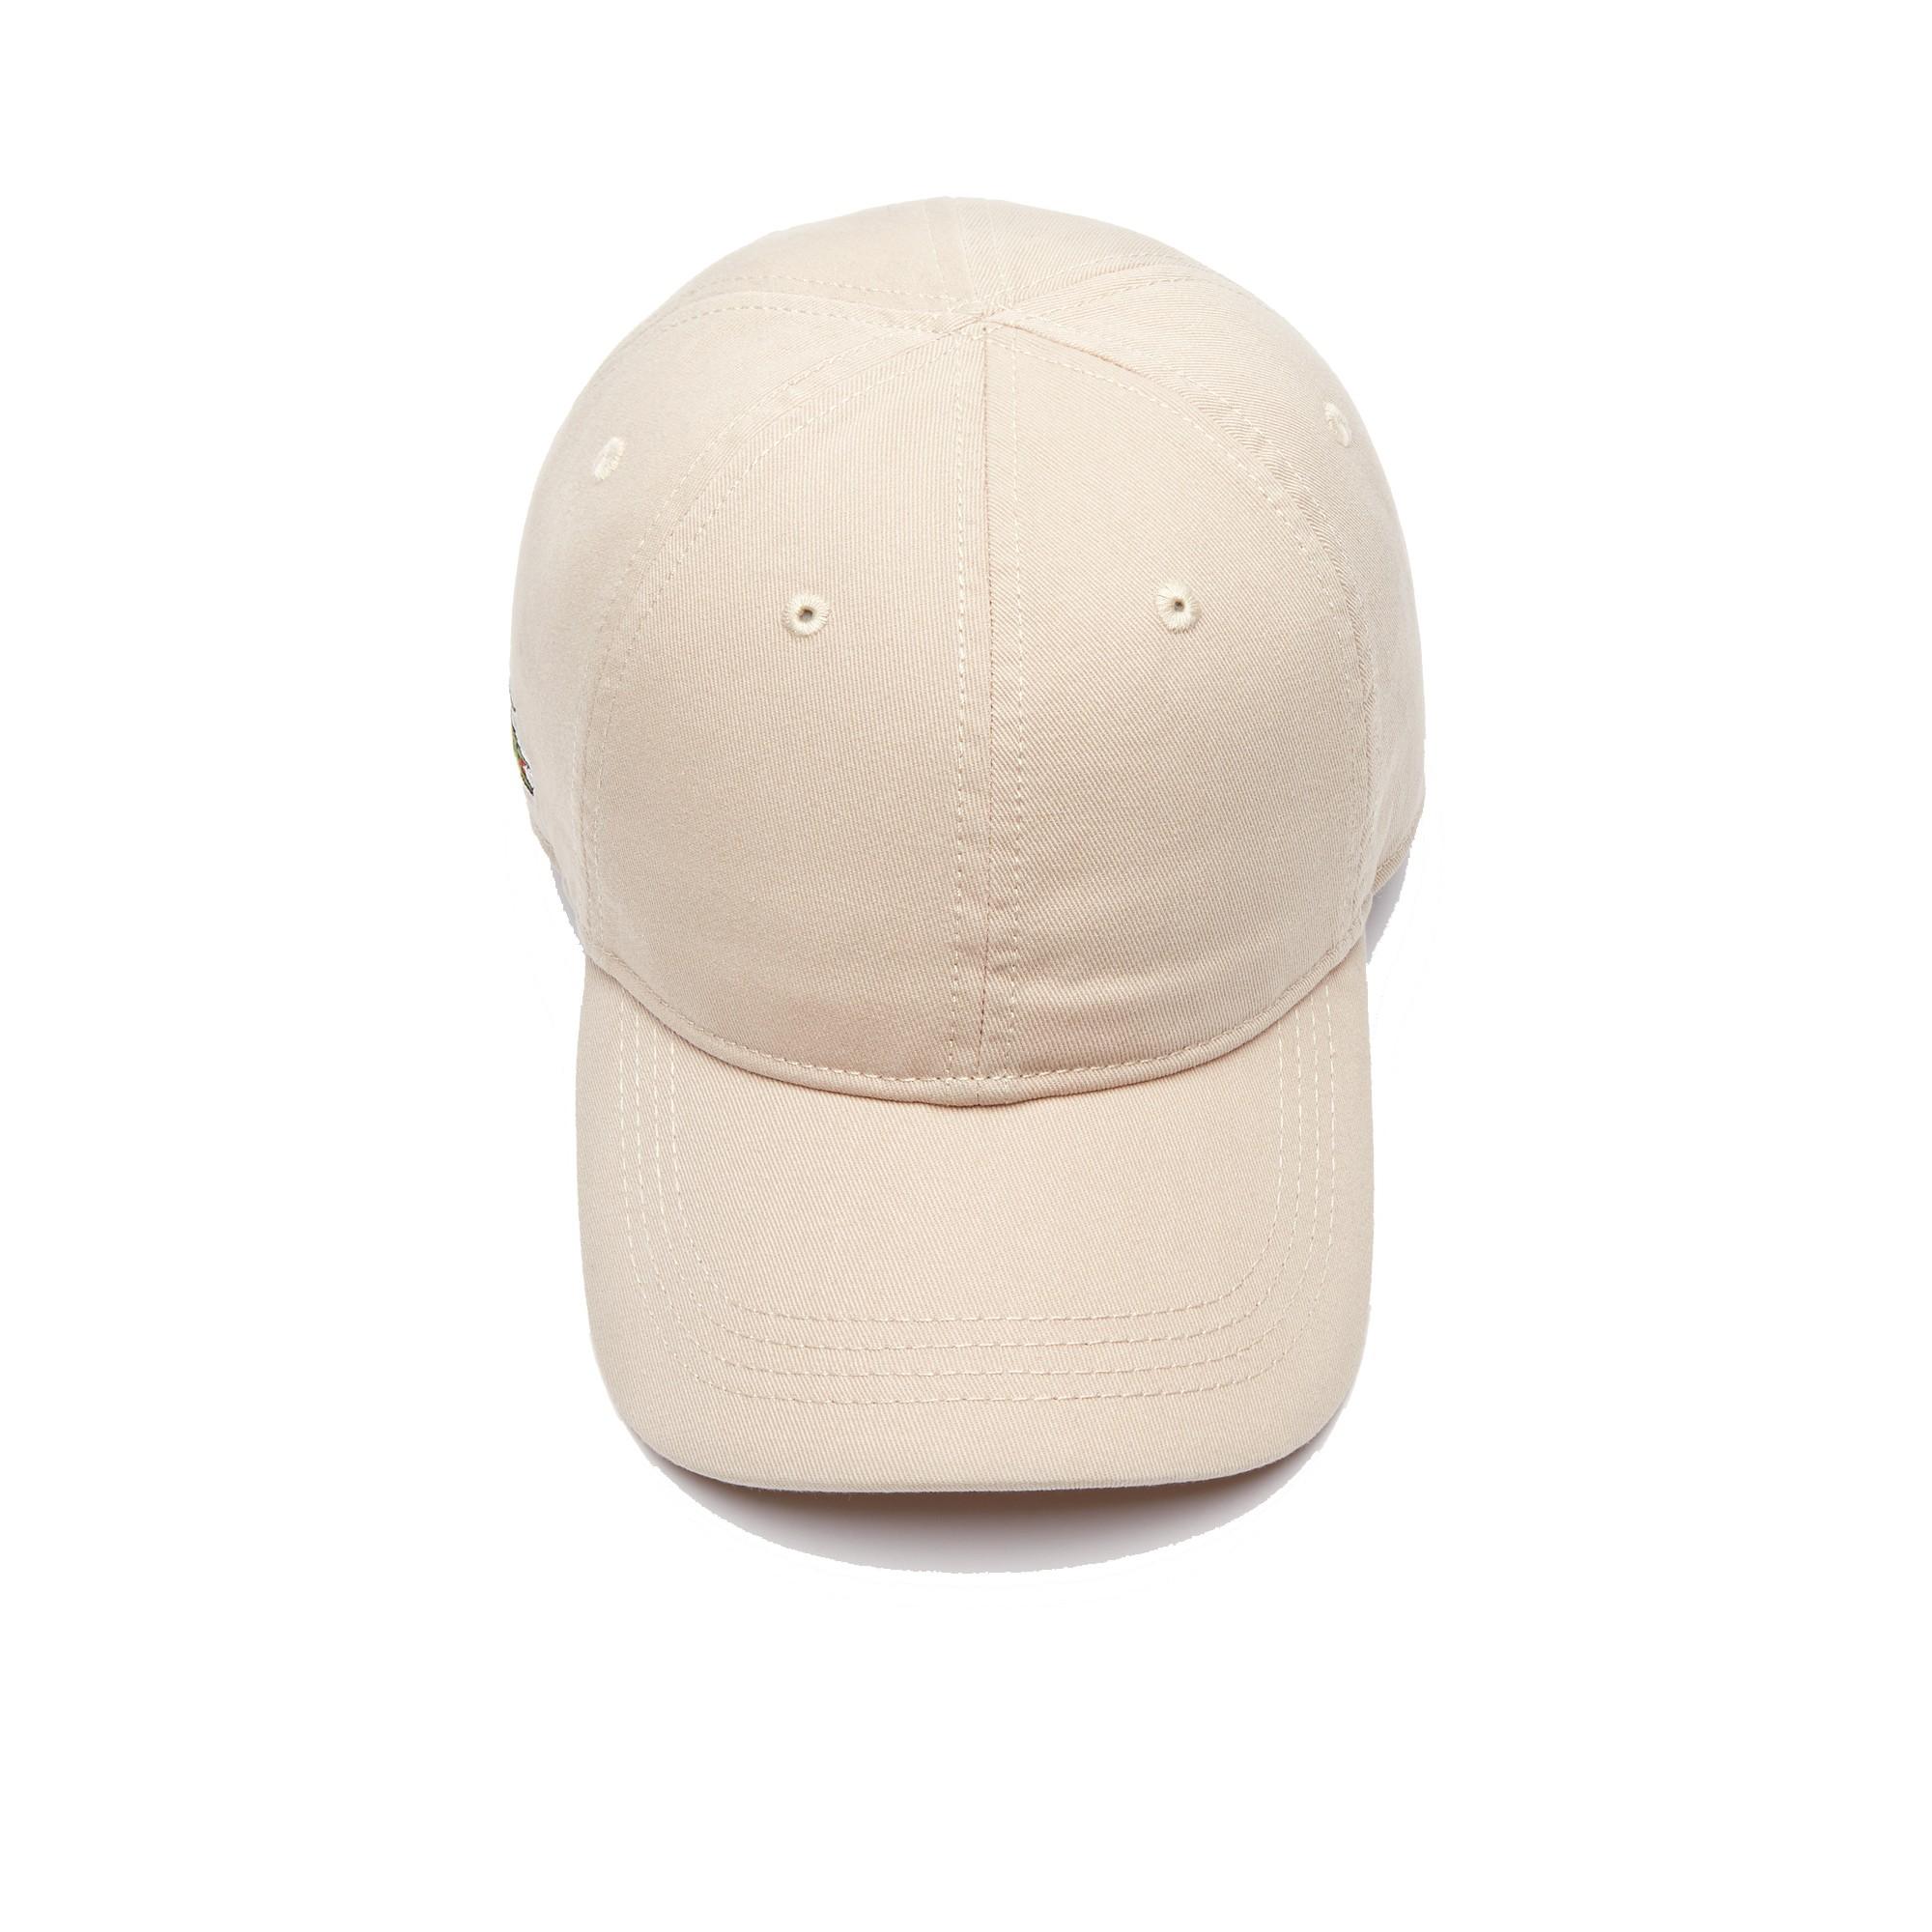 3fb6046f0 LACOSTE Caps and visors RK9811 AE0 Minor